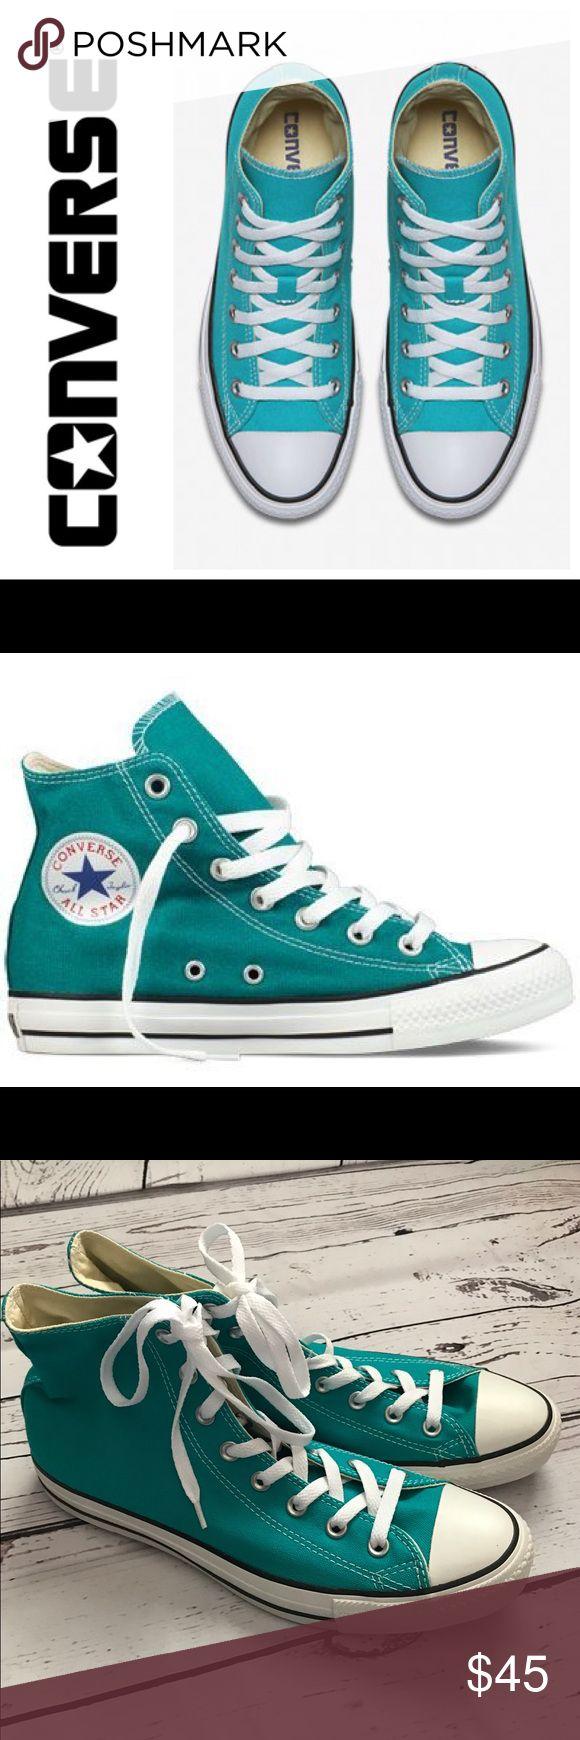 🎉Host Pick 3/5🎉Men's/Women's Converse - unisex Men's size 10 or ladies size 12 Mediterranean Blue Chuck Taylor Converse. Brand new never worn. Converse Shoes Sneakers